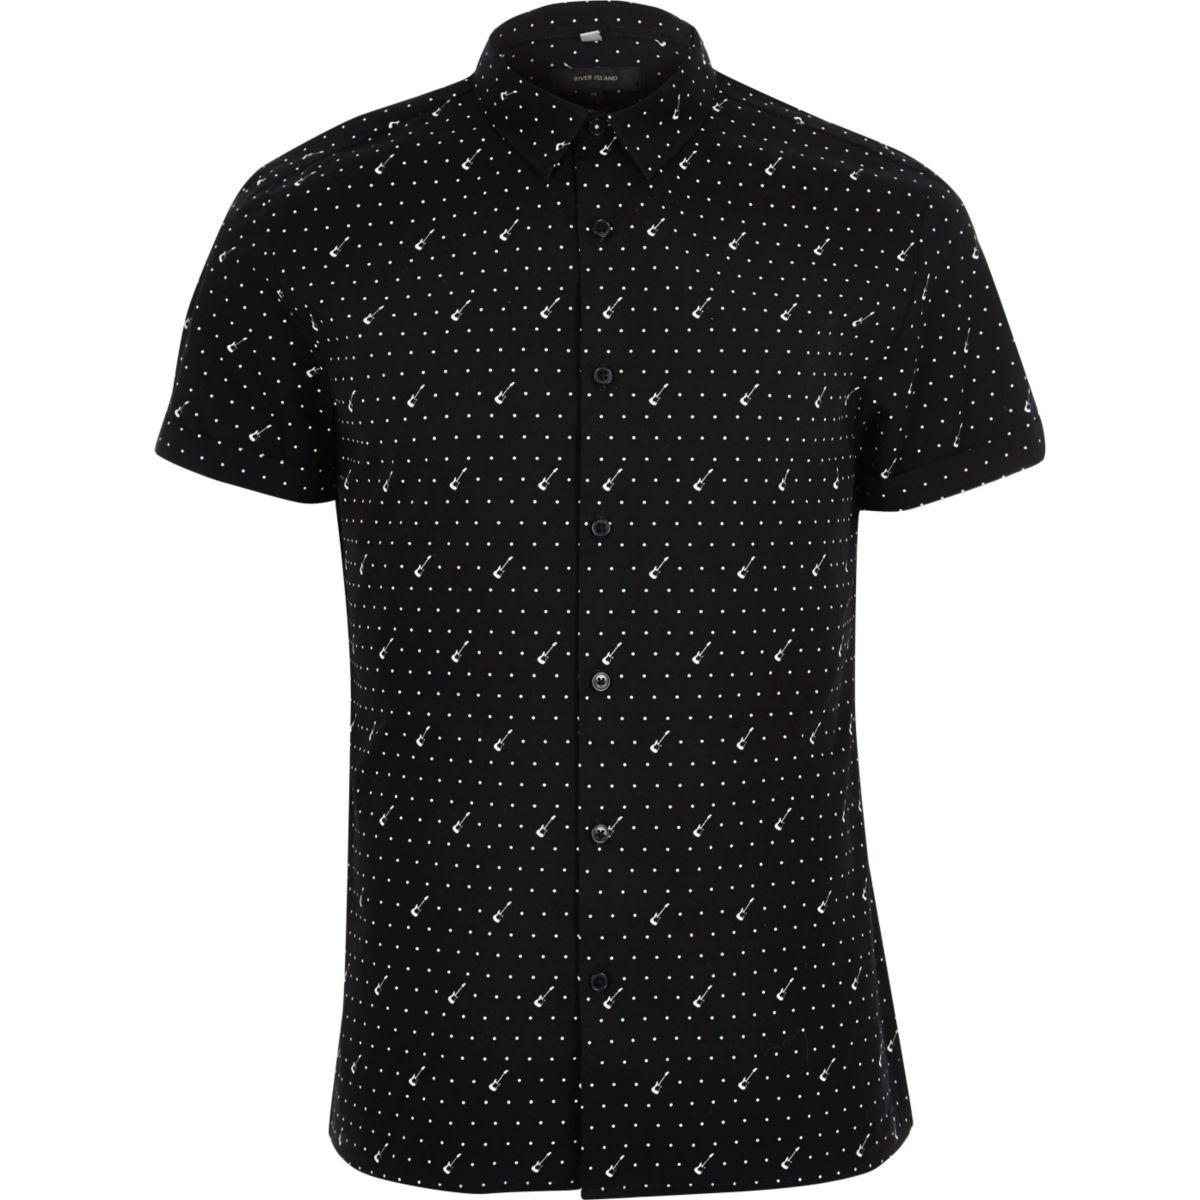 Black guitar print smart short sleeve shirt